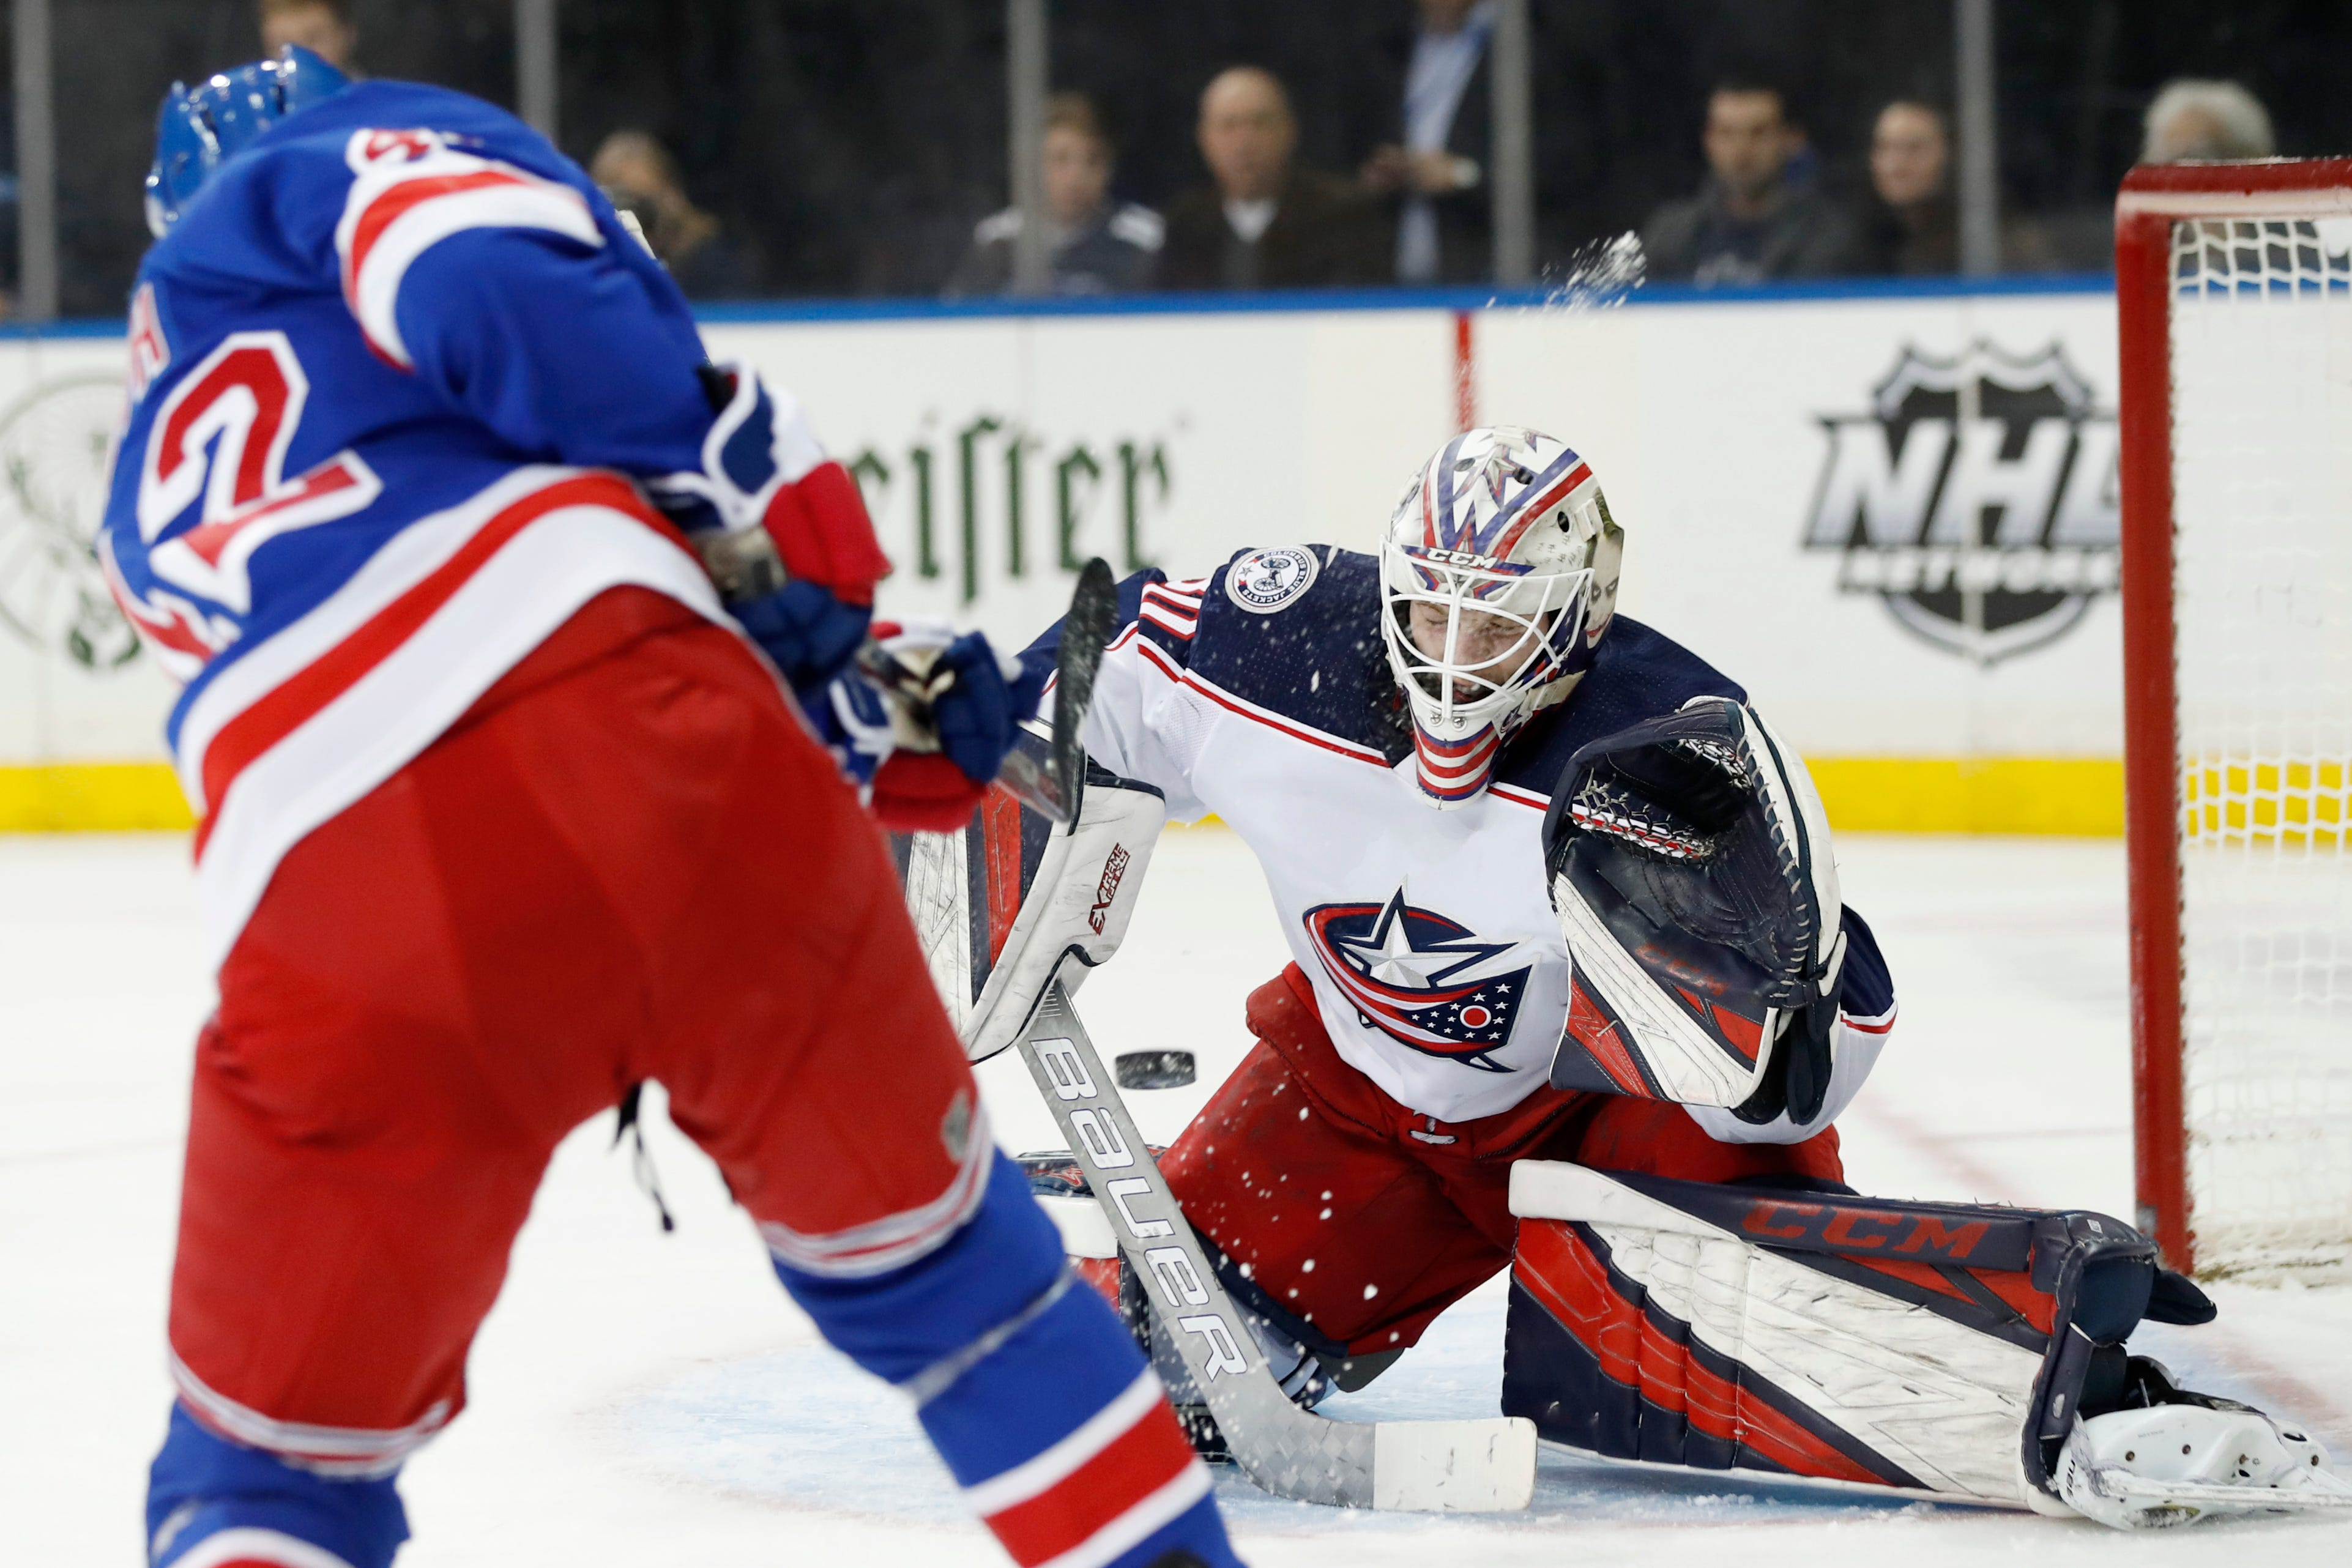 Rangers defenseman Brendan Smith shoots as Blue Jackets goalie Matiss Kivlenieks reacts during the second period of an NHL hockey game, Sunday, Jan. 19, 2020, in New York.